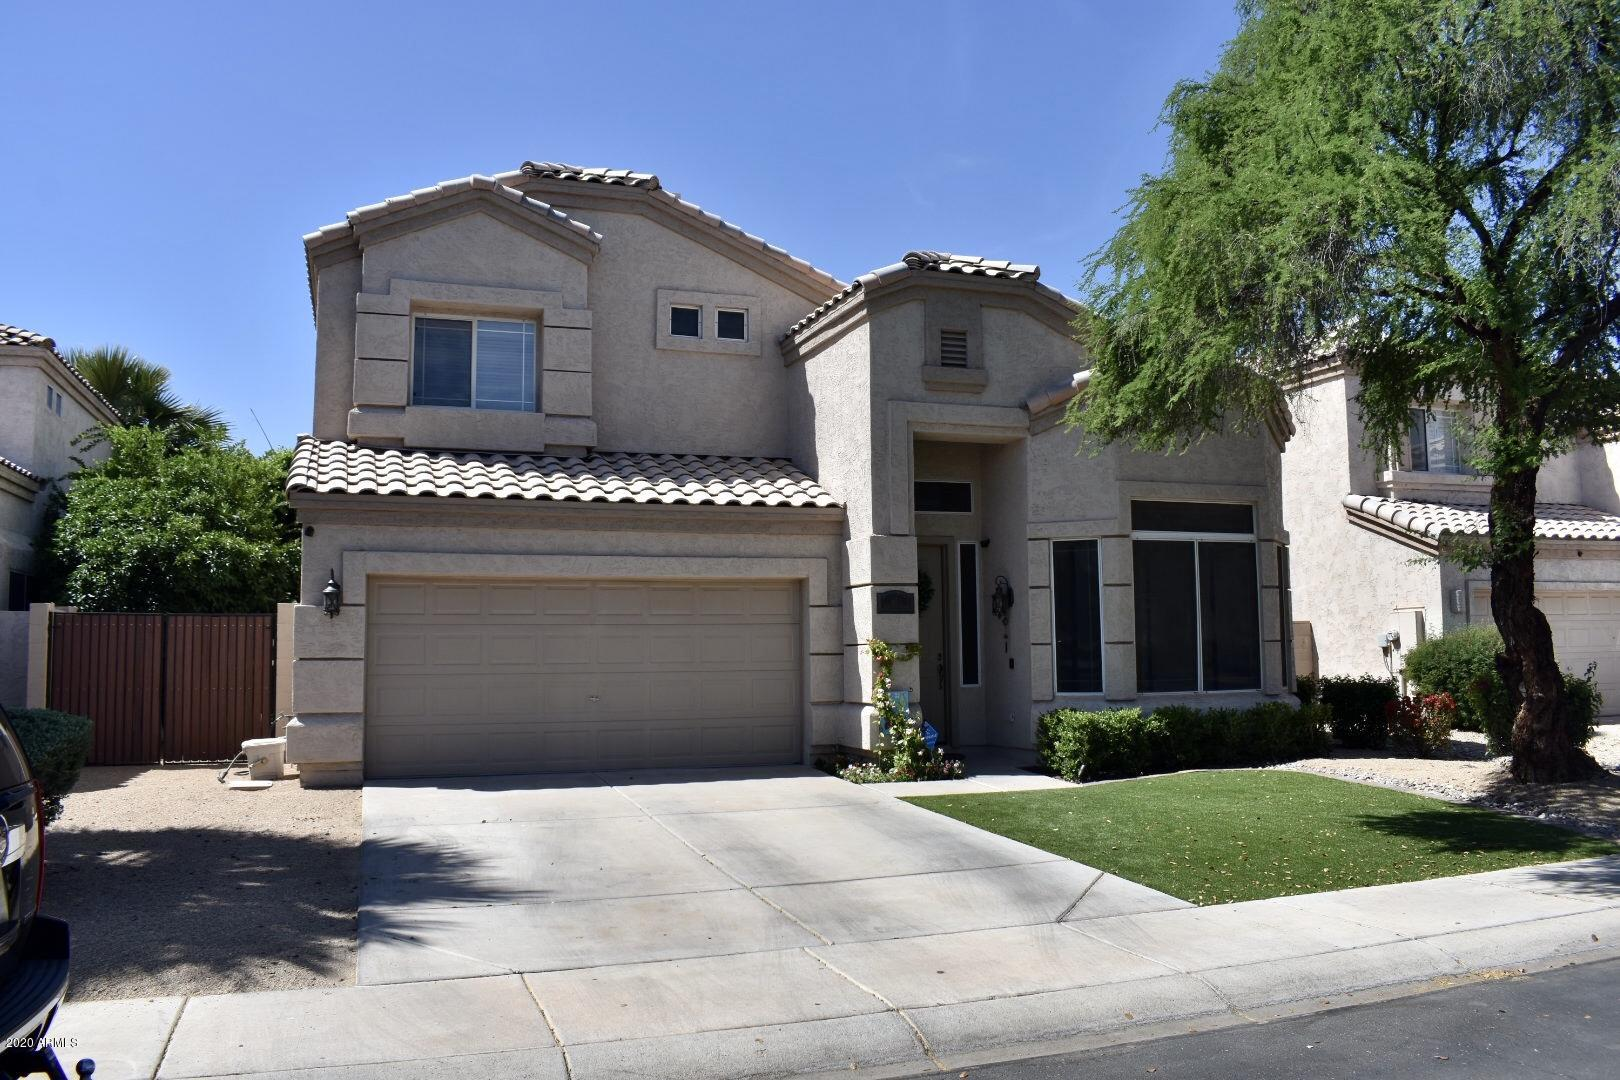 Photo of 631 W KENT Place, Chandler, AZ 85225